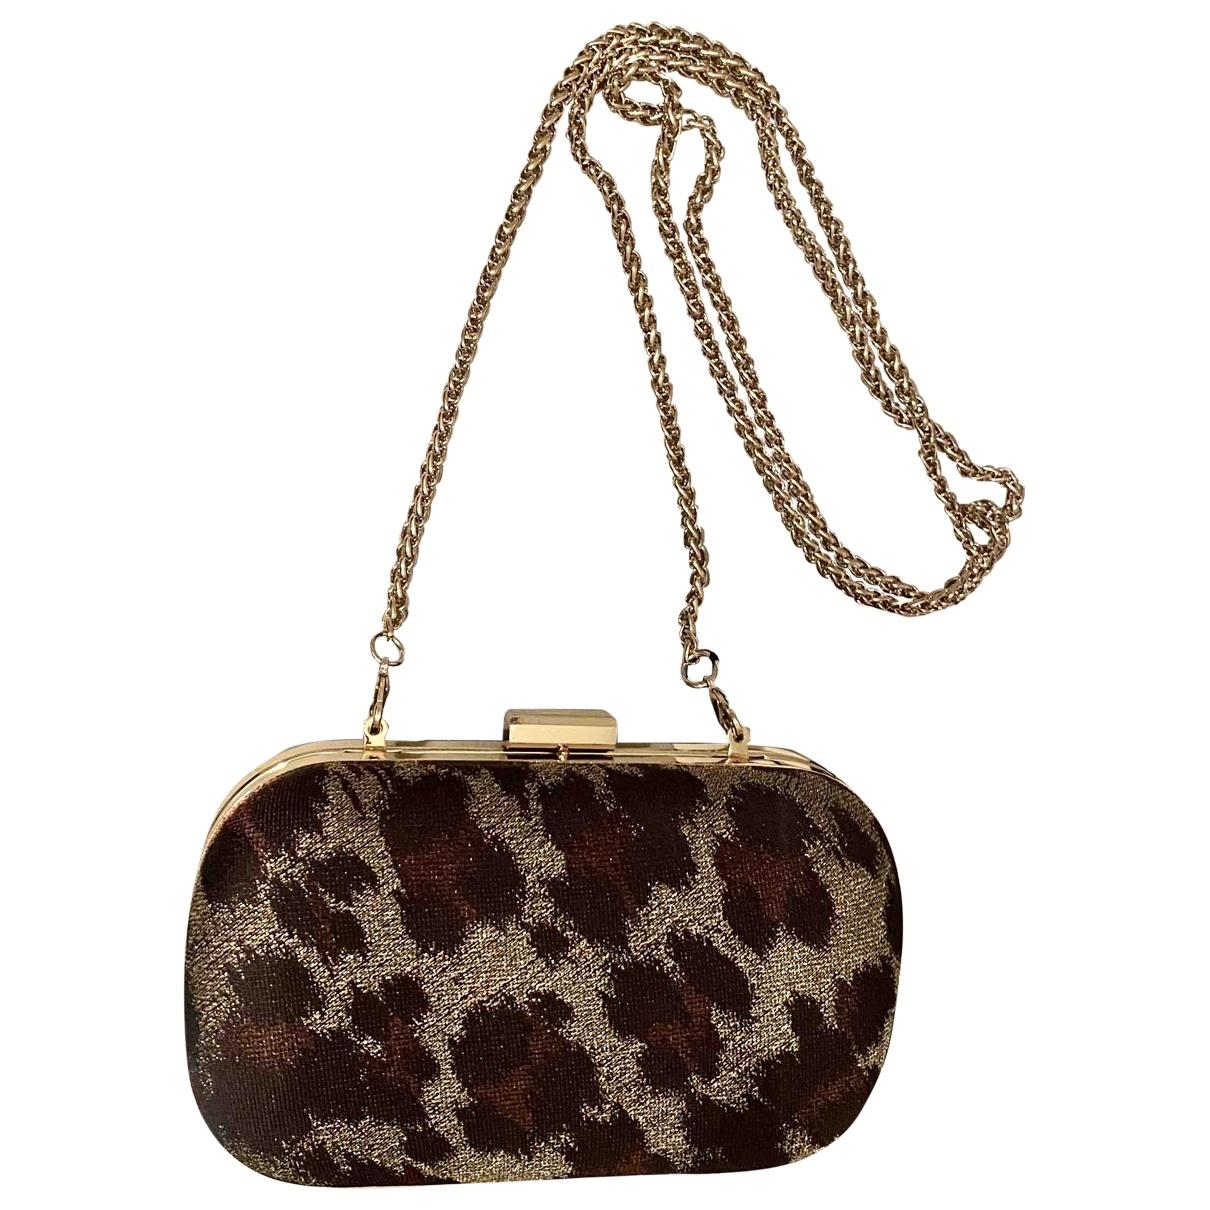 Karen Millen \N Gold Cotton Clutch bag for Women \N